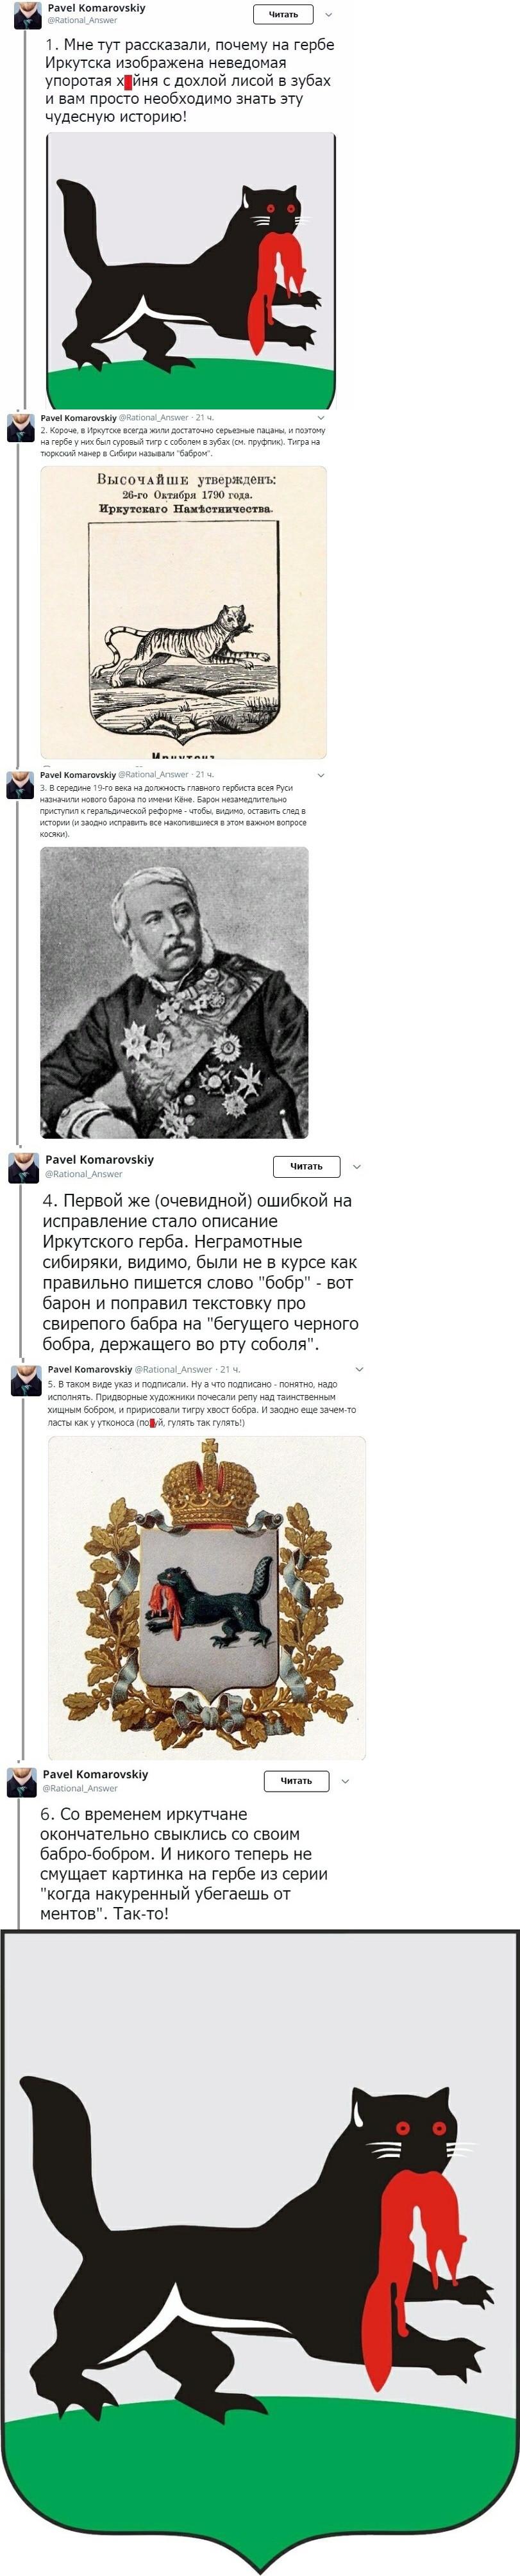 http://www.picshare.ru/uploads/190627/AU97qR6TPv.jpg